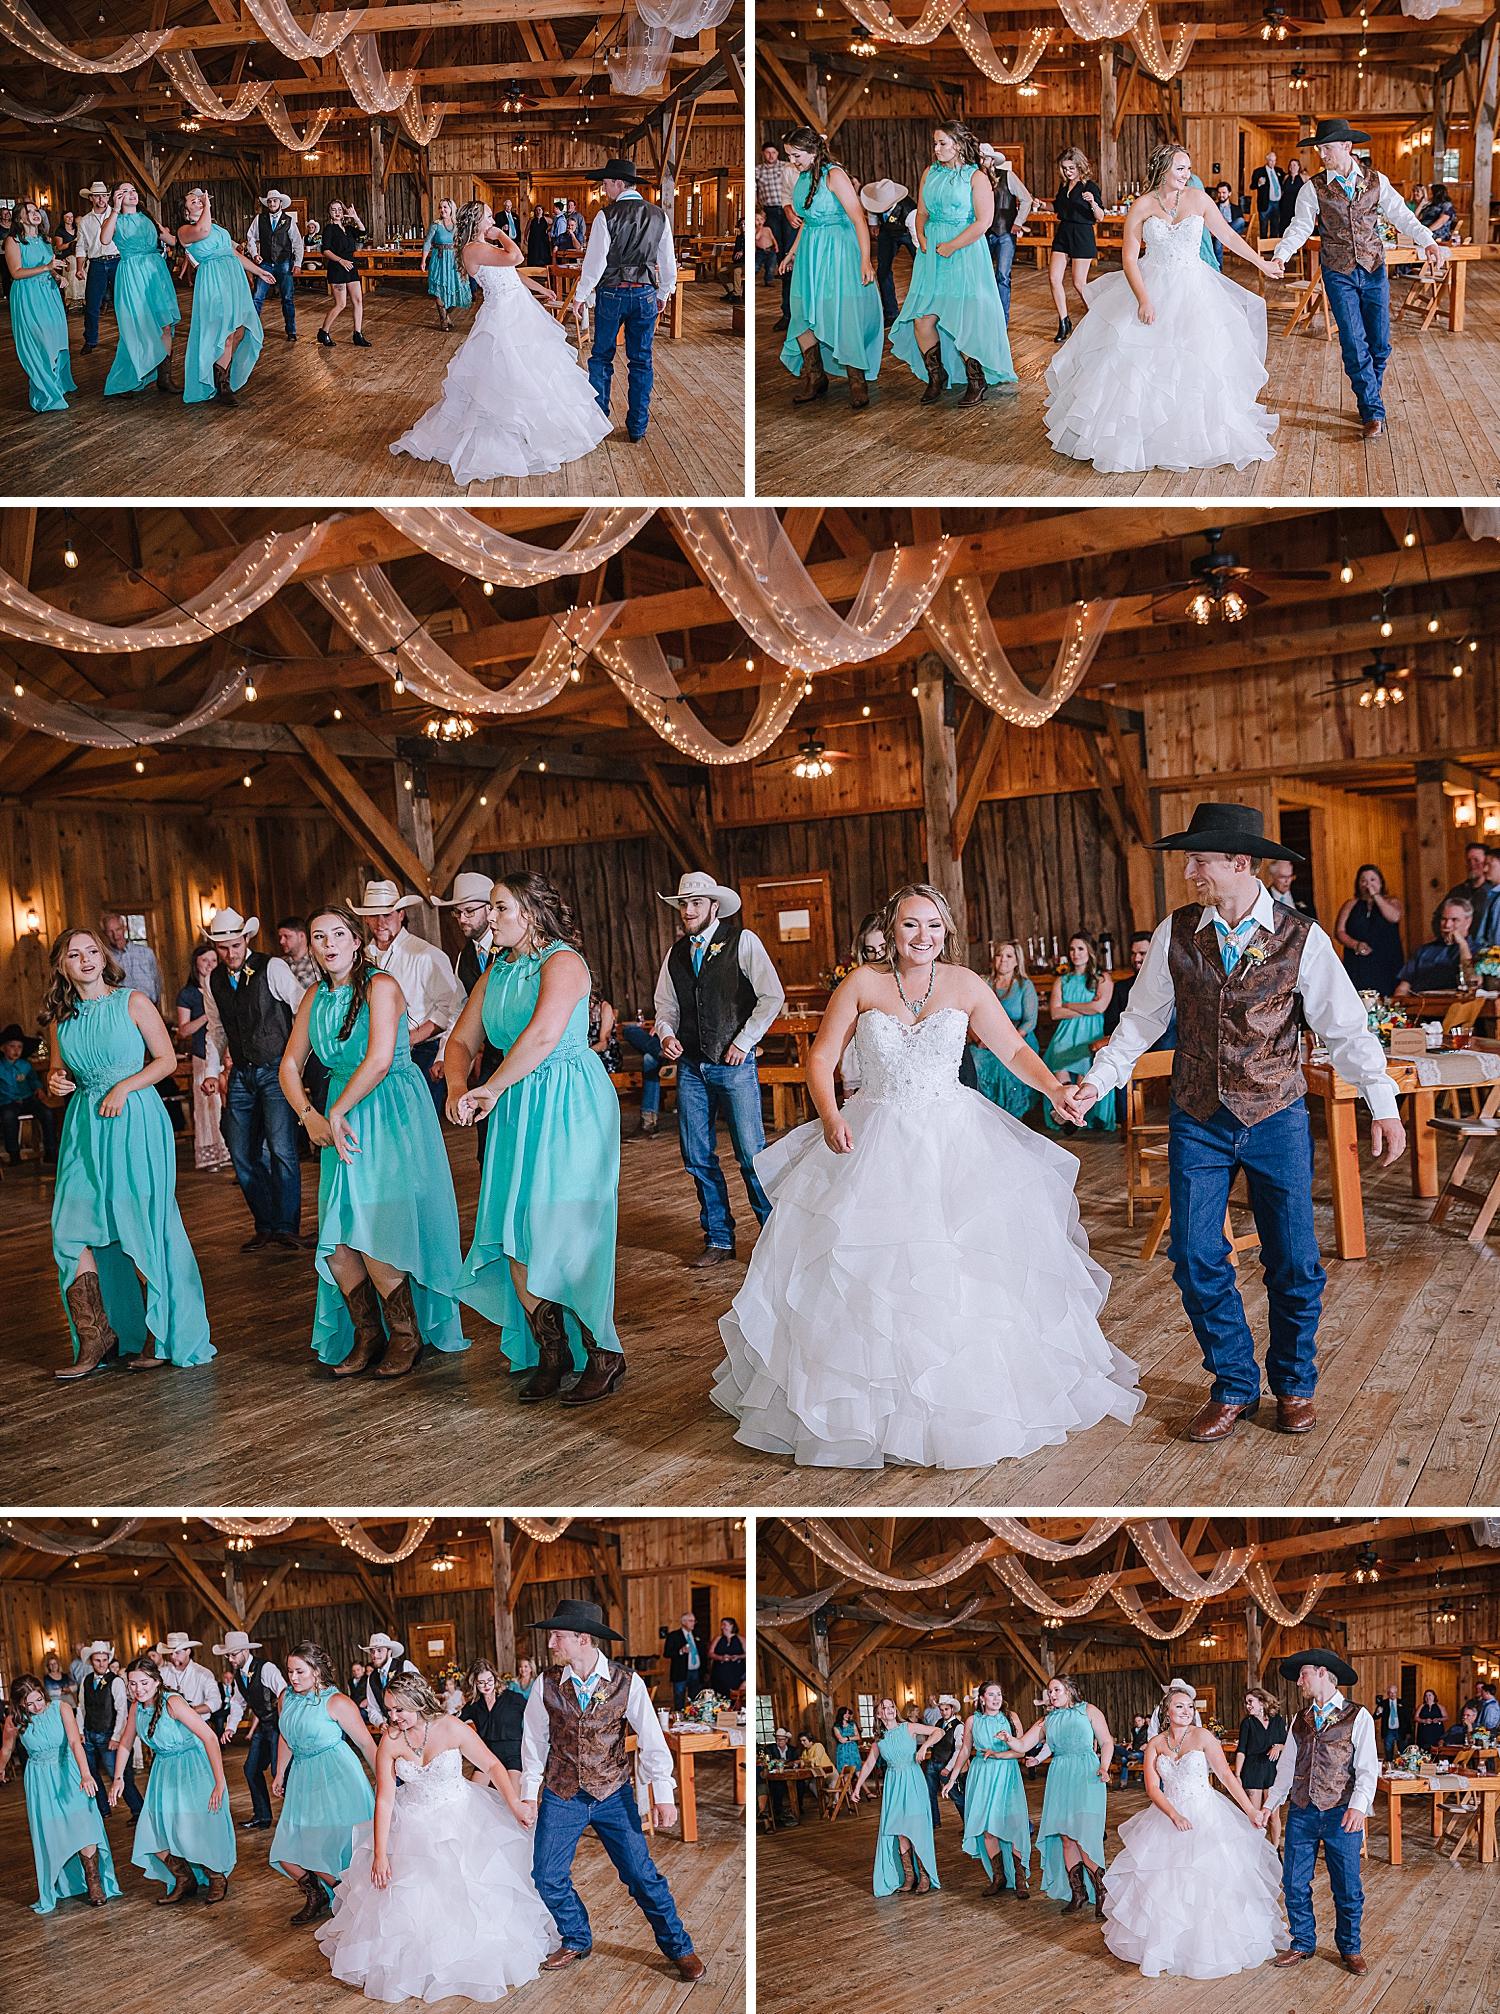 Carly-Barton-Photography-Old-Town-Texas-Rustic-Wedding-Photos-Sunflowers-Boots-Kyle-Texas_0075.jpg